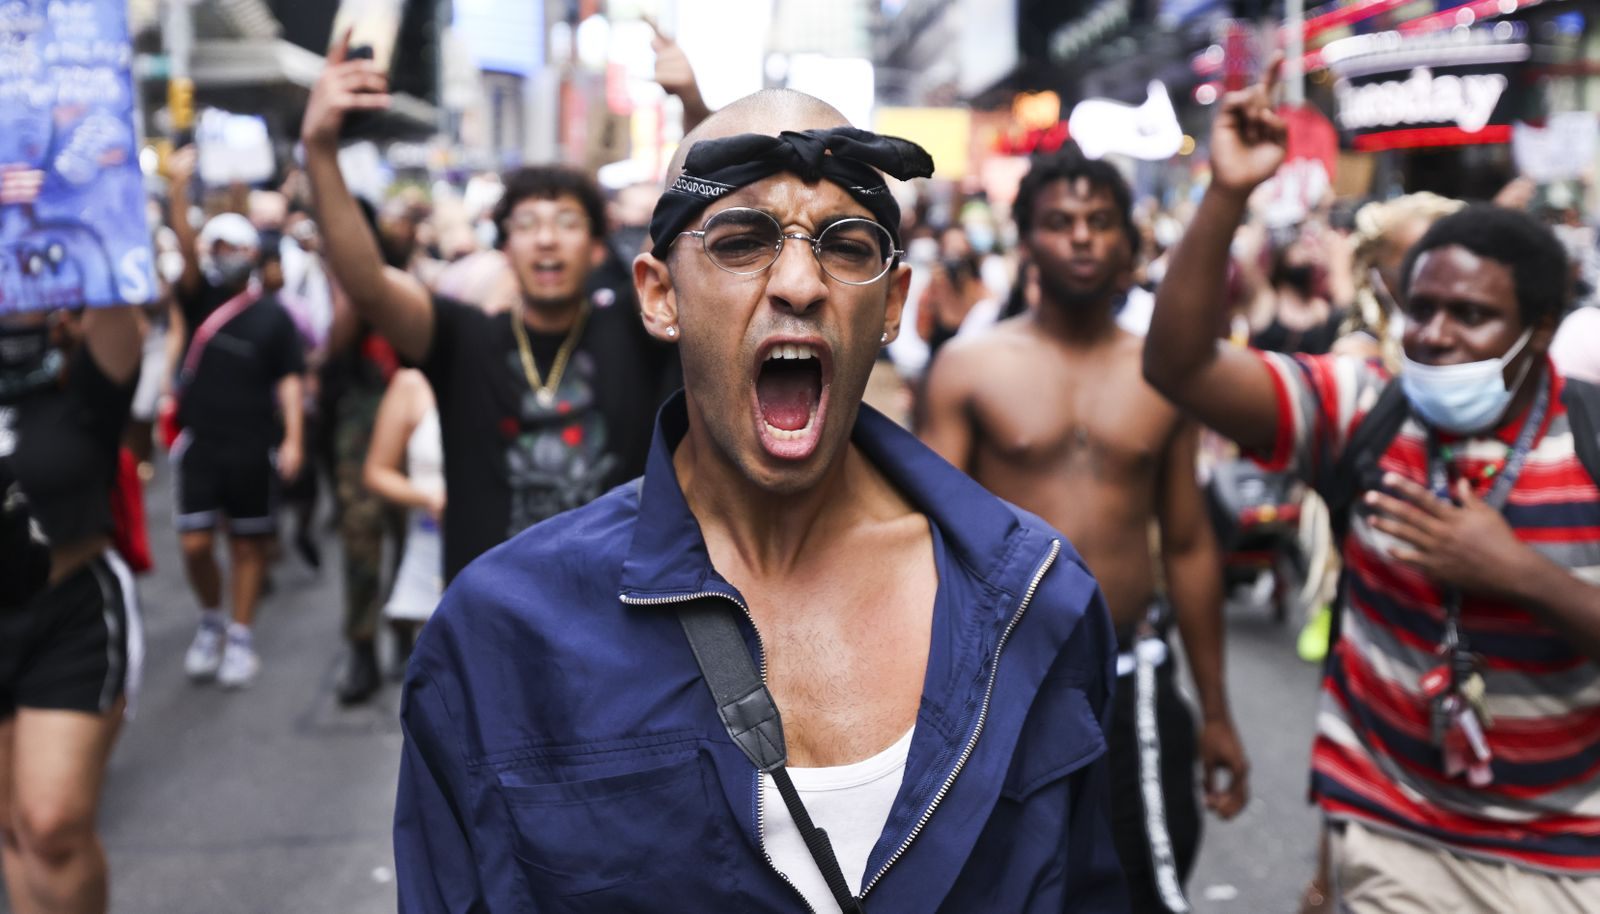 New York Protest In Response to Jacob Blake Shooting, USA - 24 Aug 2020